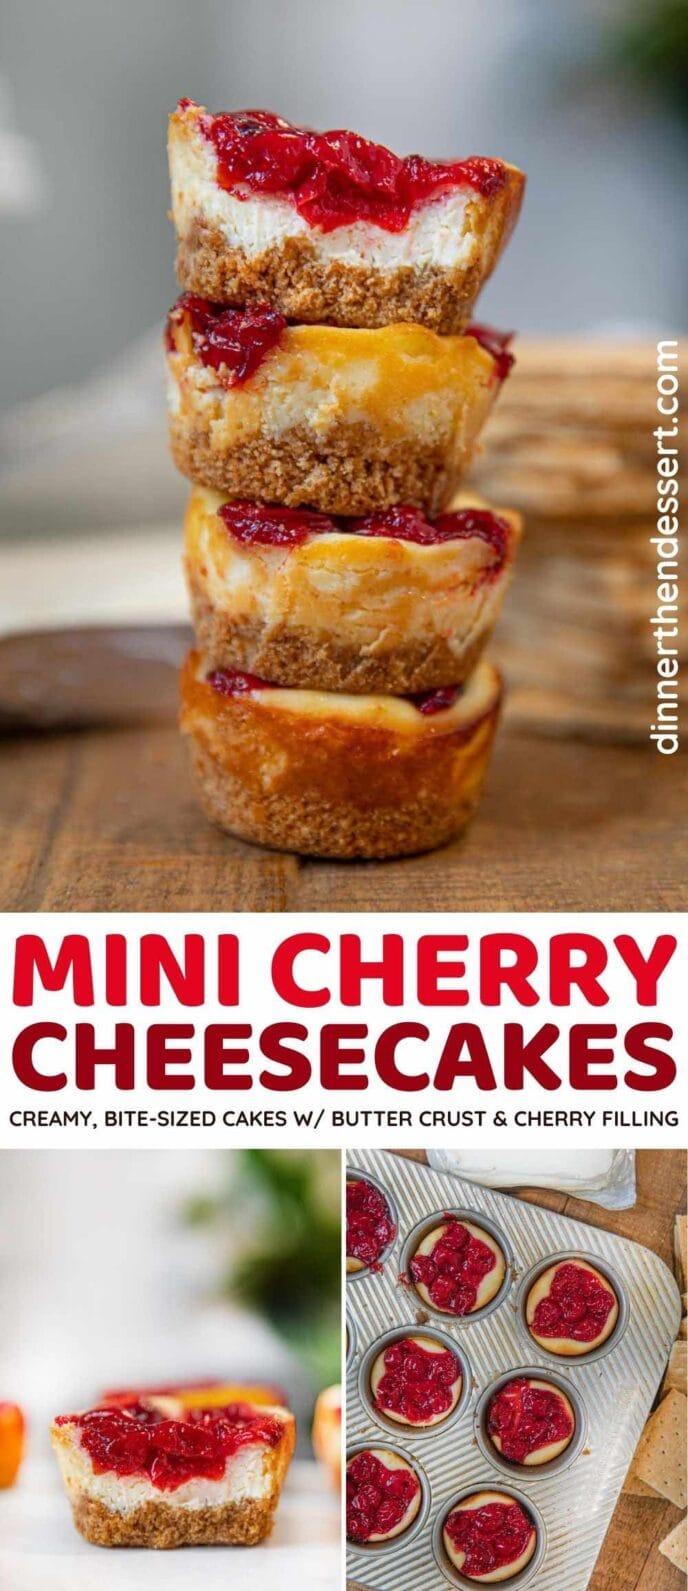 Mini Cherry Cheesecake collage